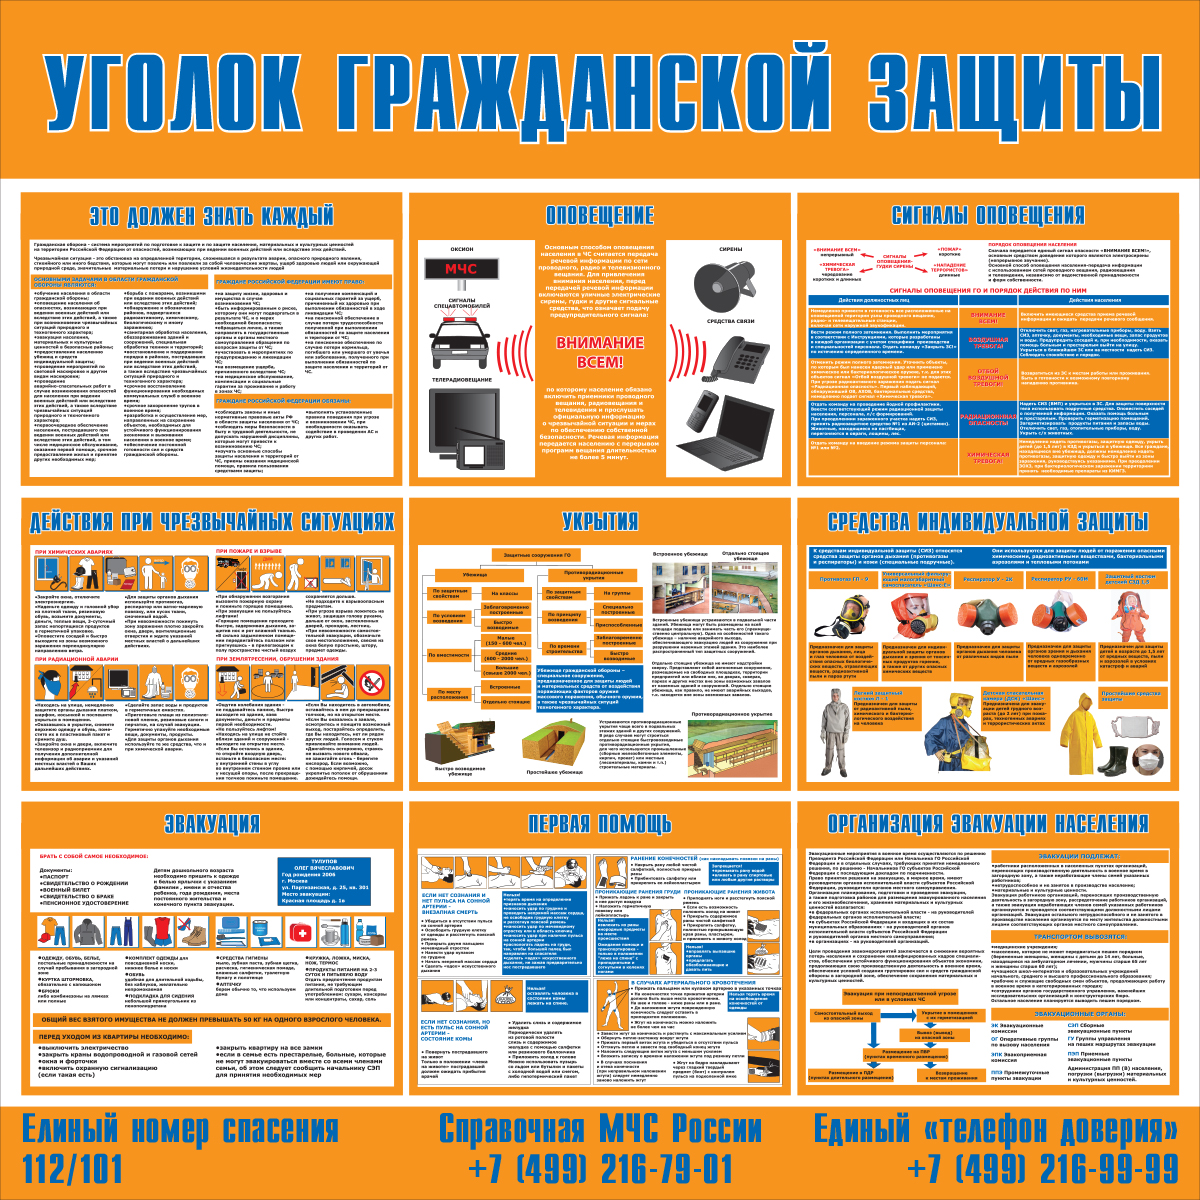 плакат Уголок гражданской защиты  1000х1000 мм